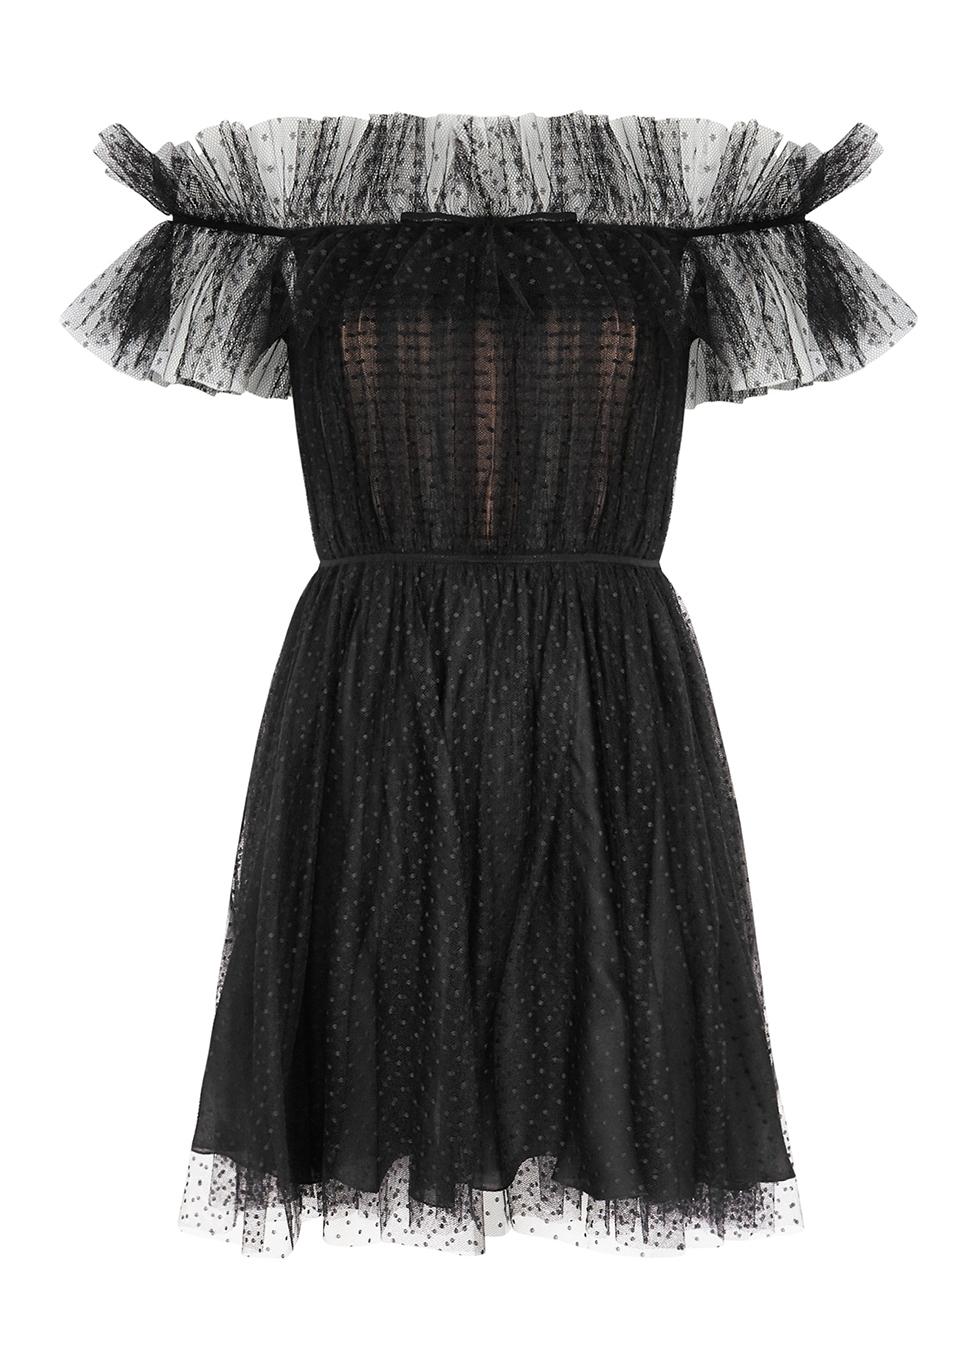 Designer Dresses   Designer Gowns - Harvey Nichols d229b00354a